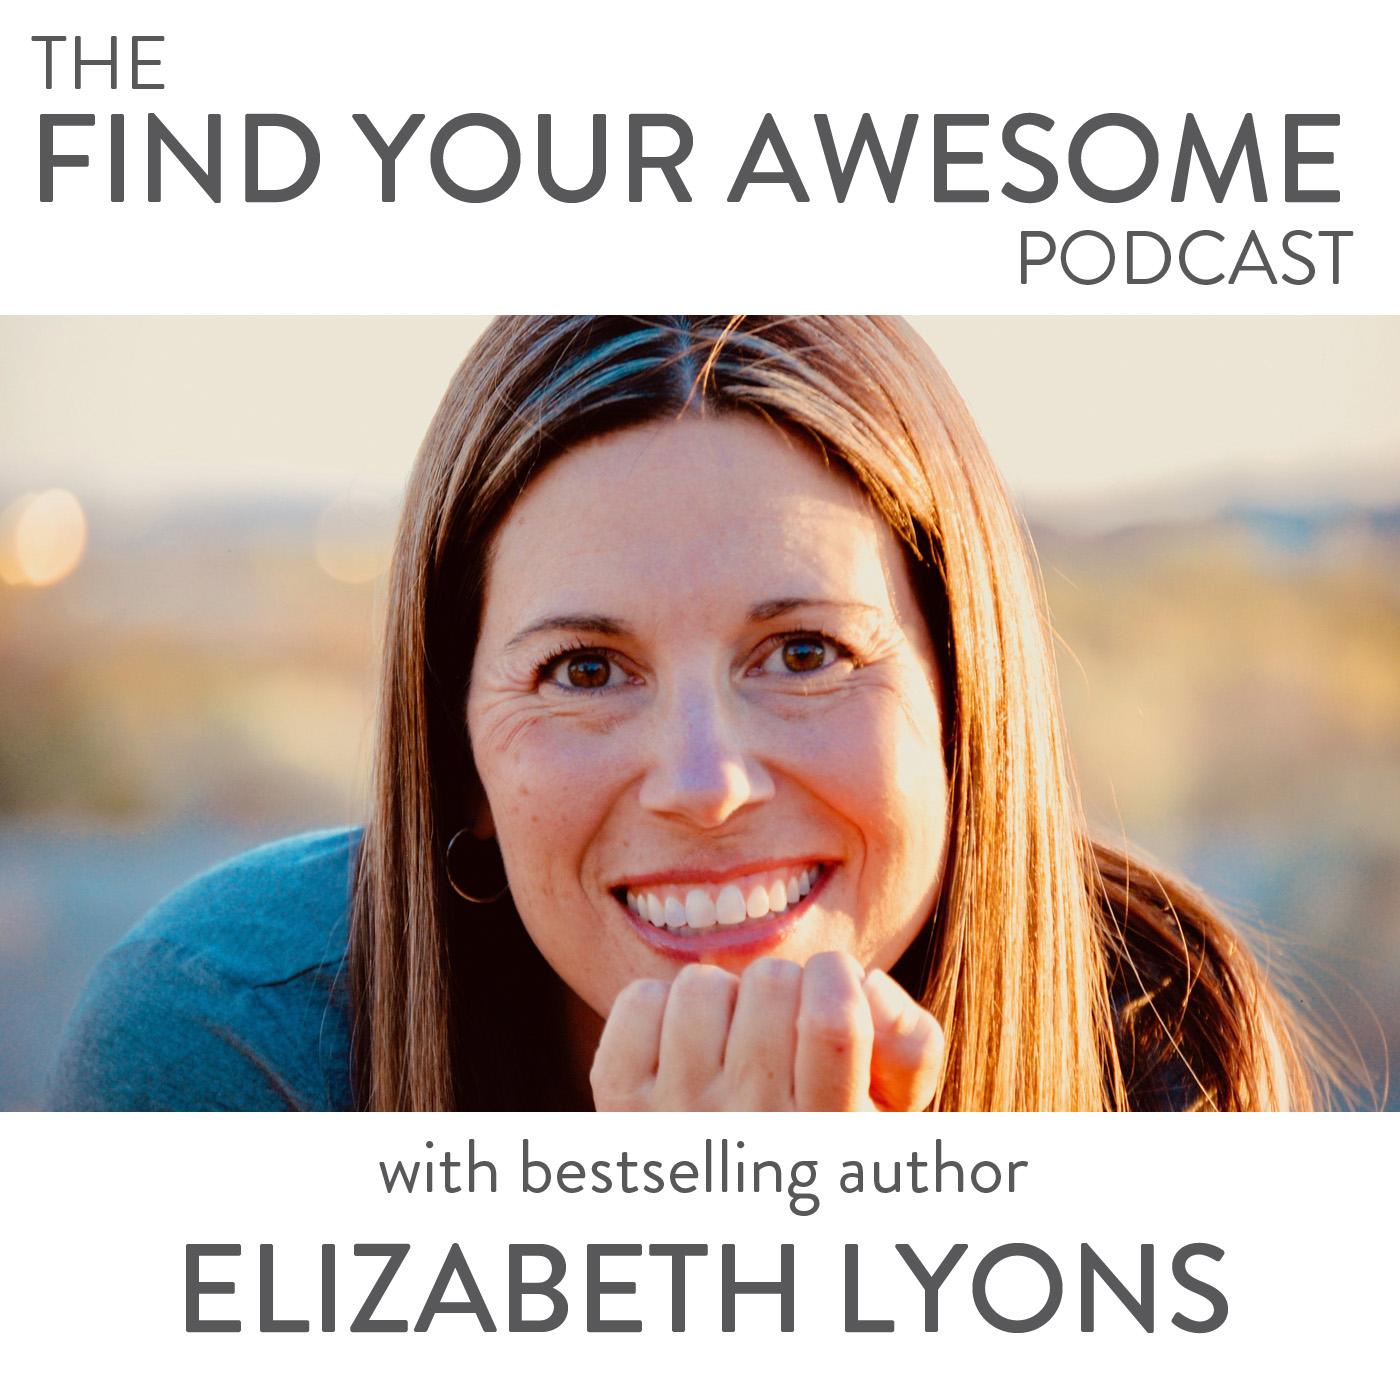 ElizabethLyons_podcast_coverart.jpg